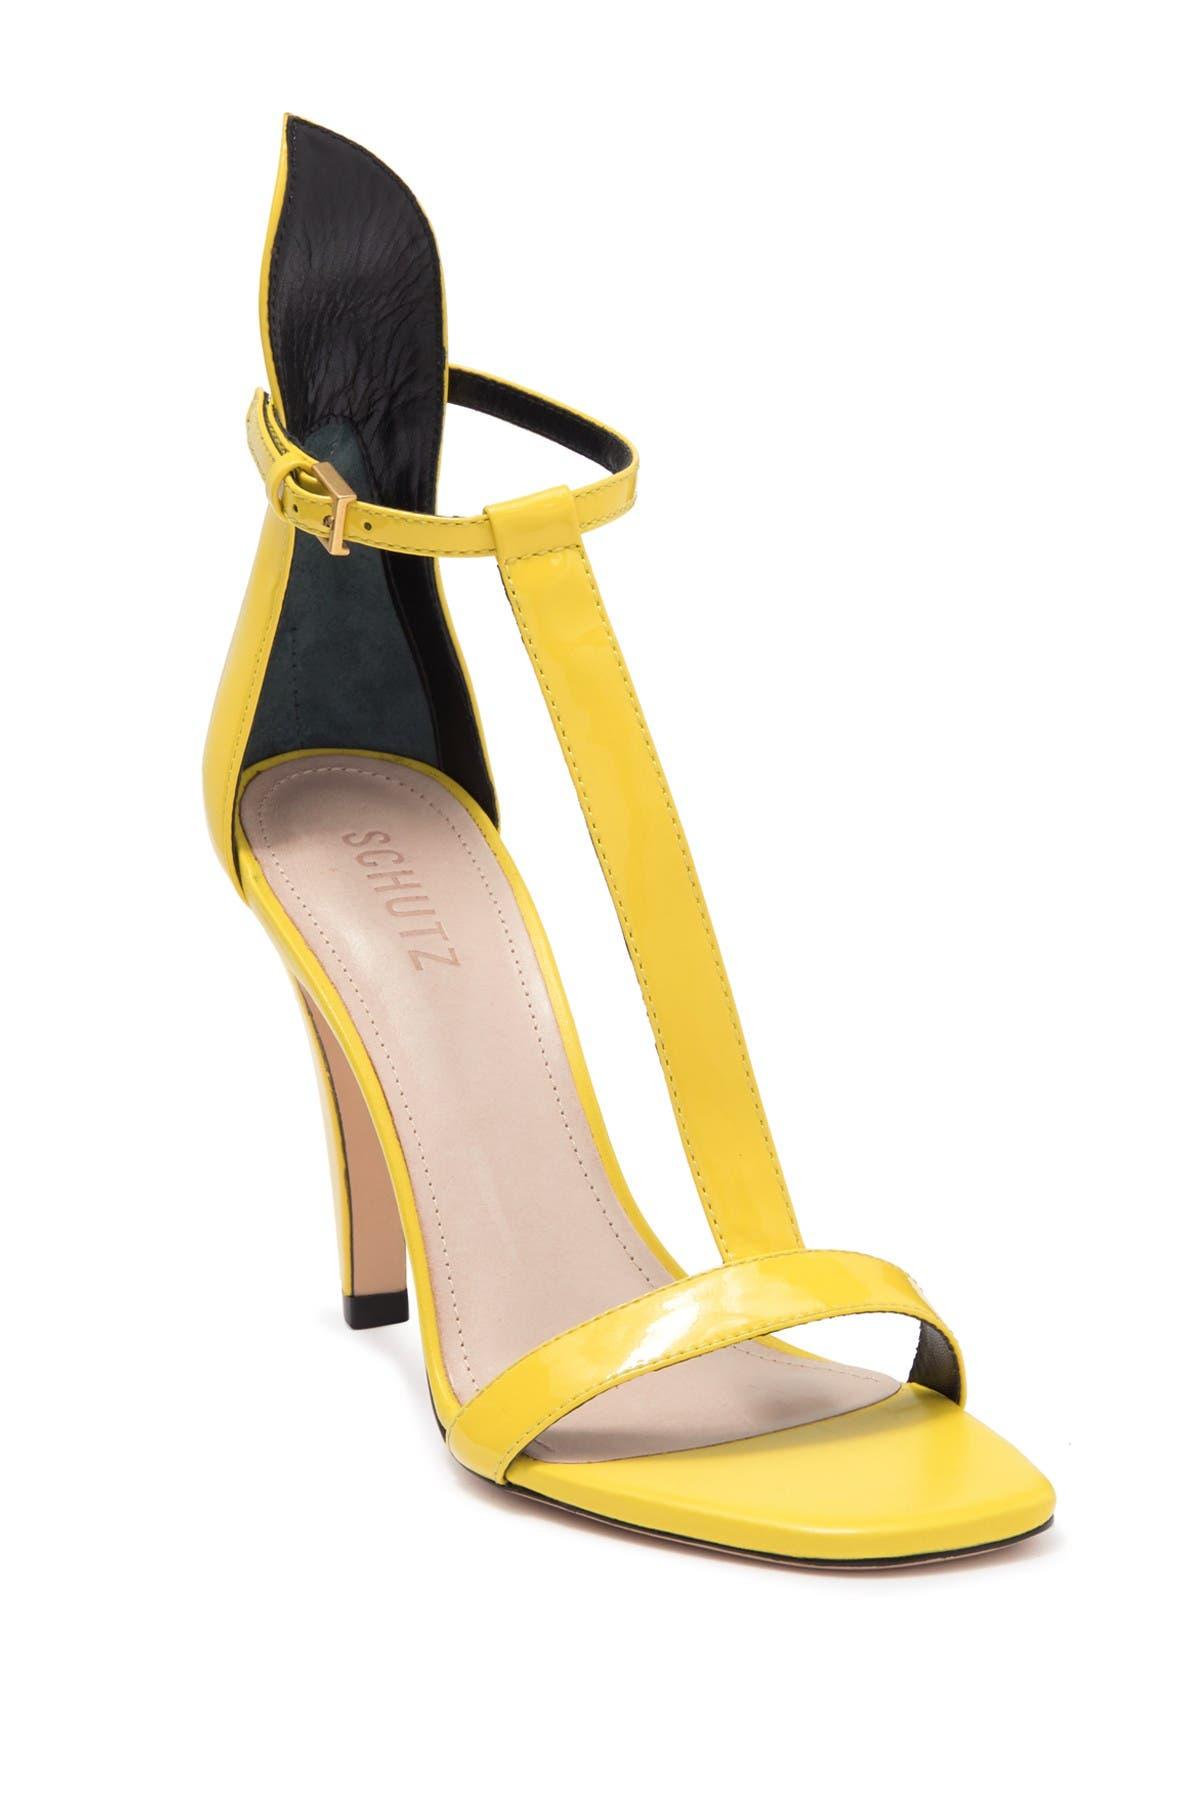 Image of Schutz Gwenyth Leather T-Strap Sandal